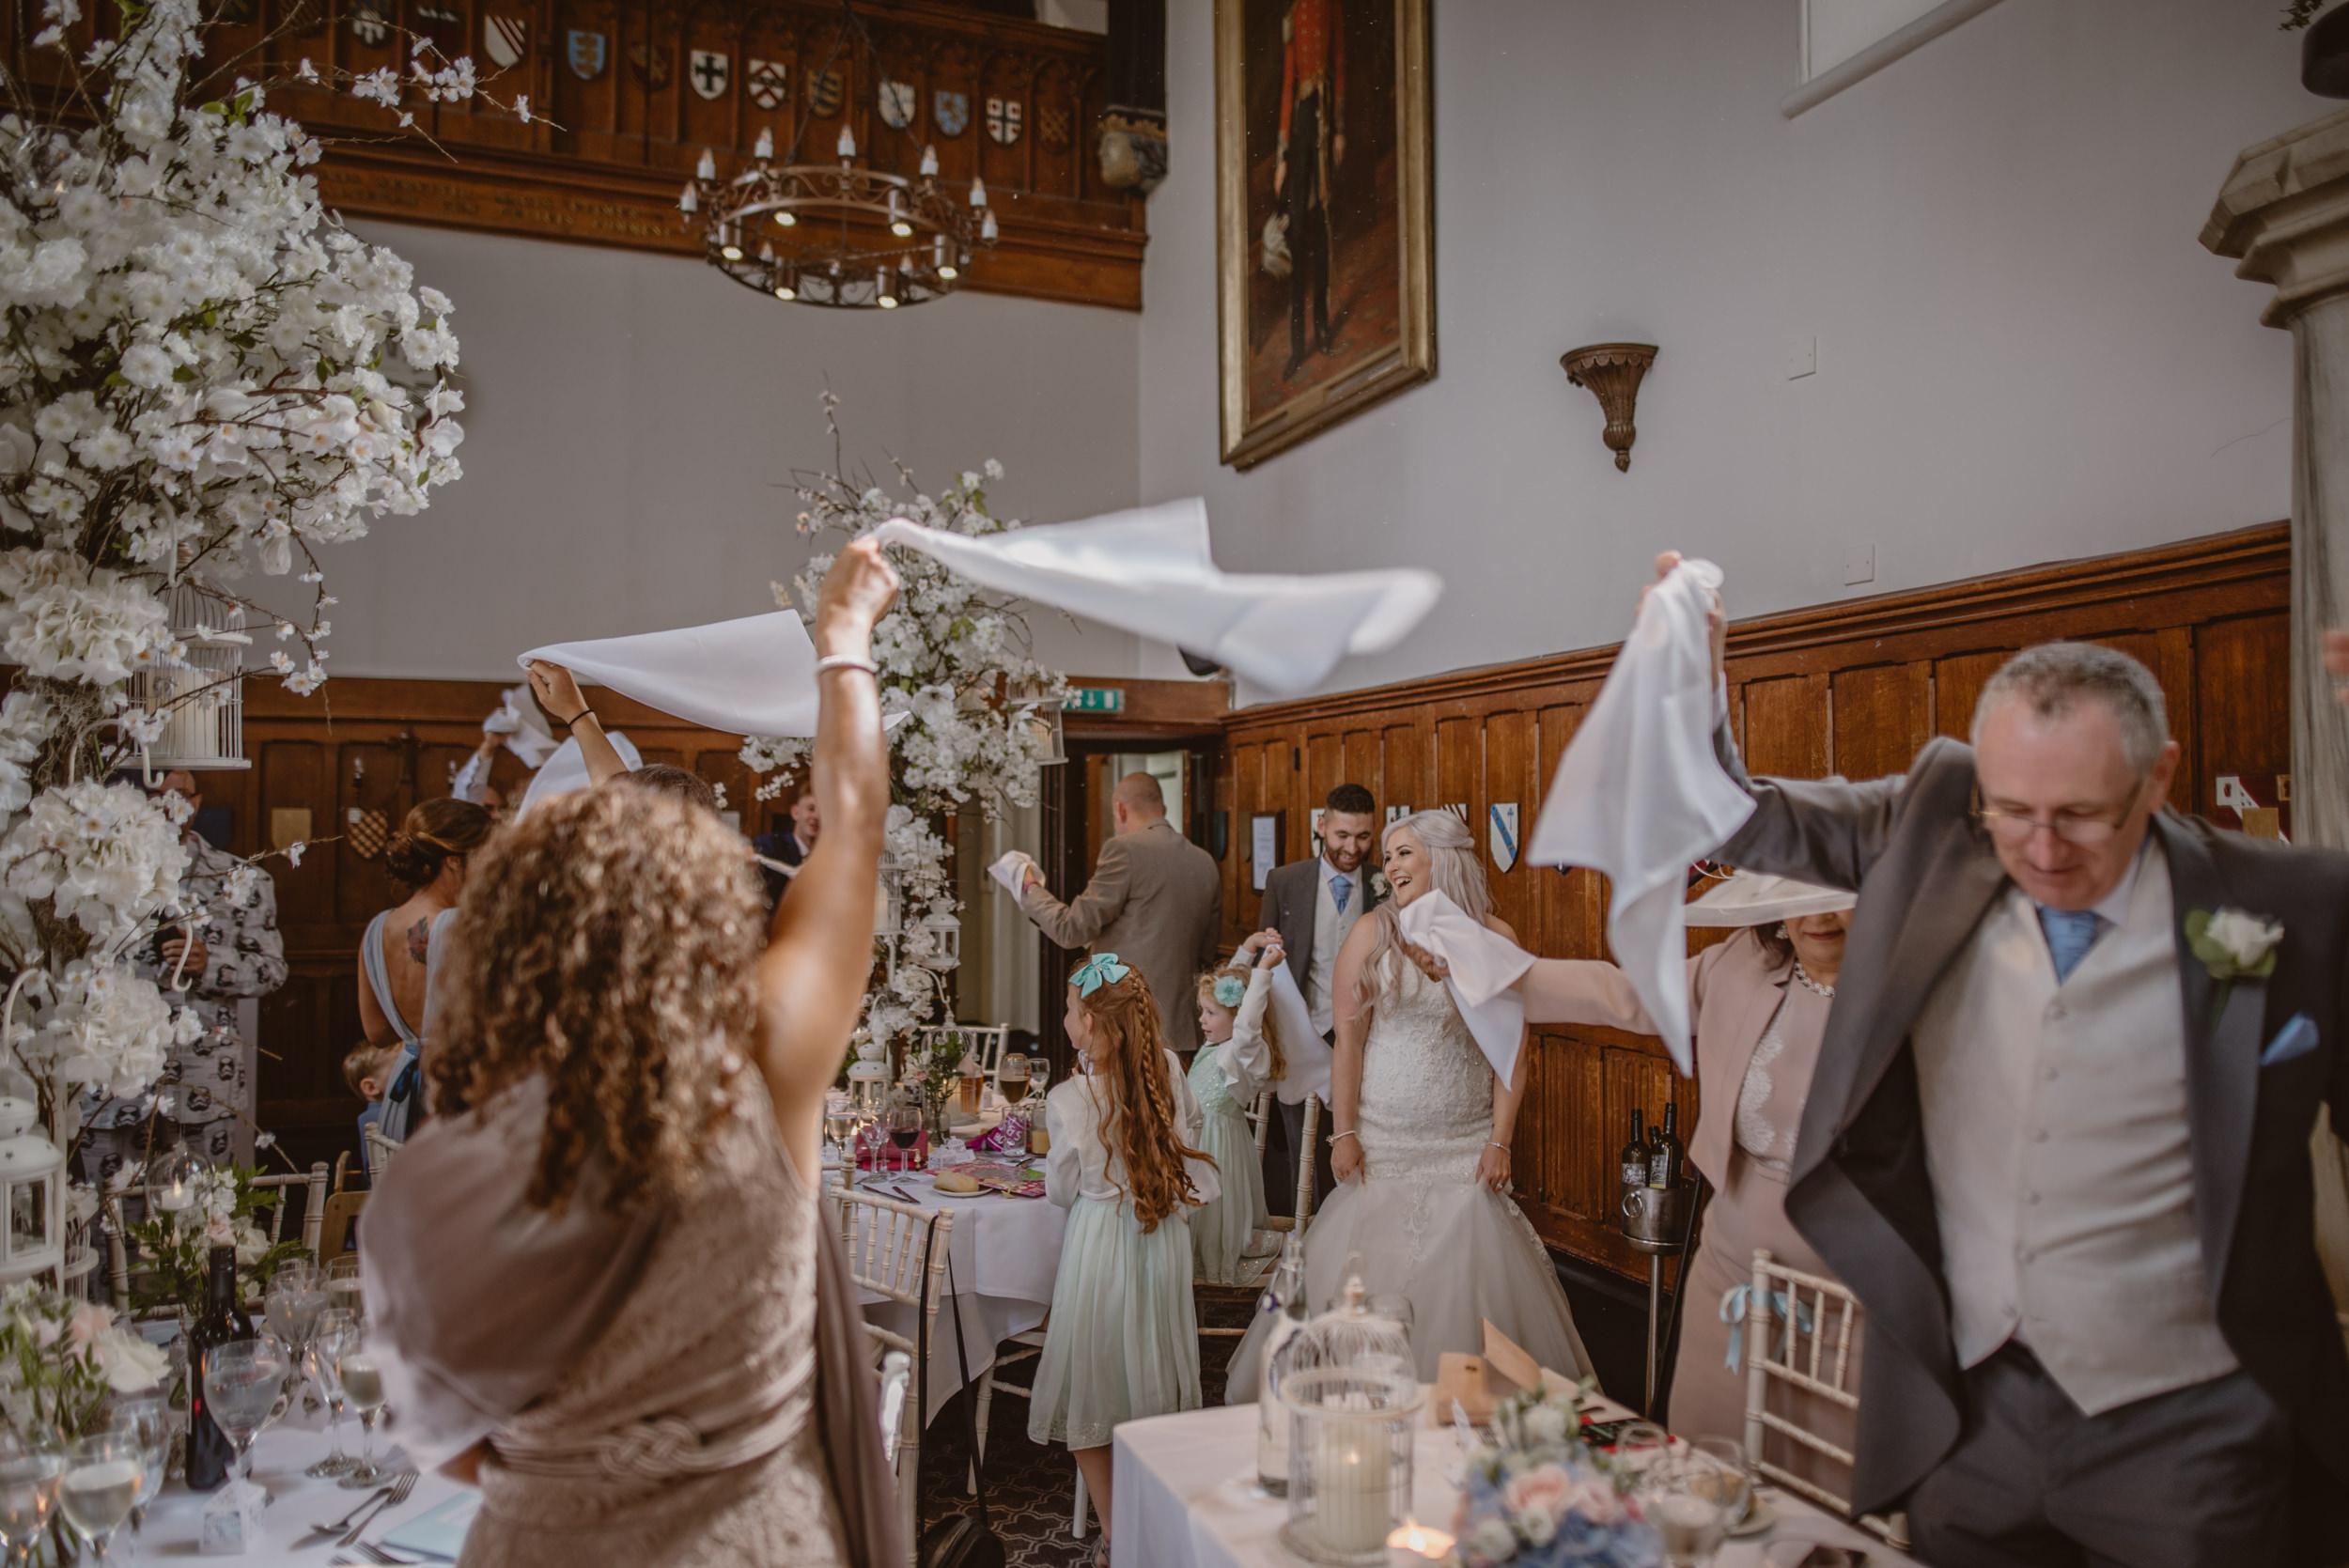 Rachel-and-James-Wedding-Horsley-Towers-State-Manu-Mendoza-Wedding-Photography-384.jpg